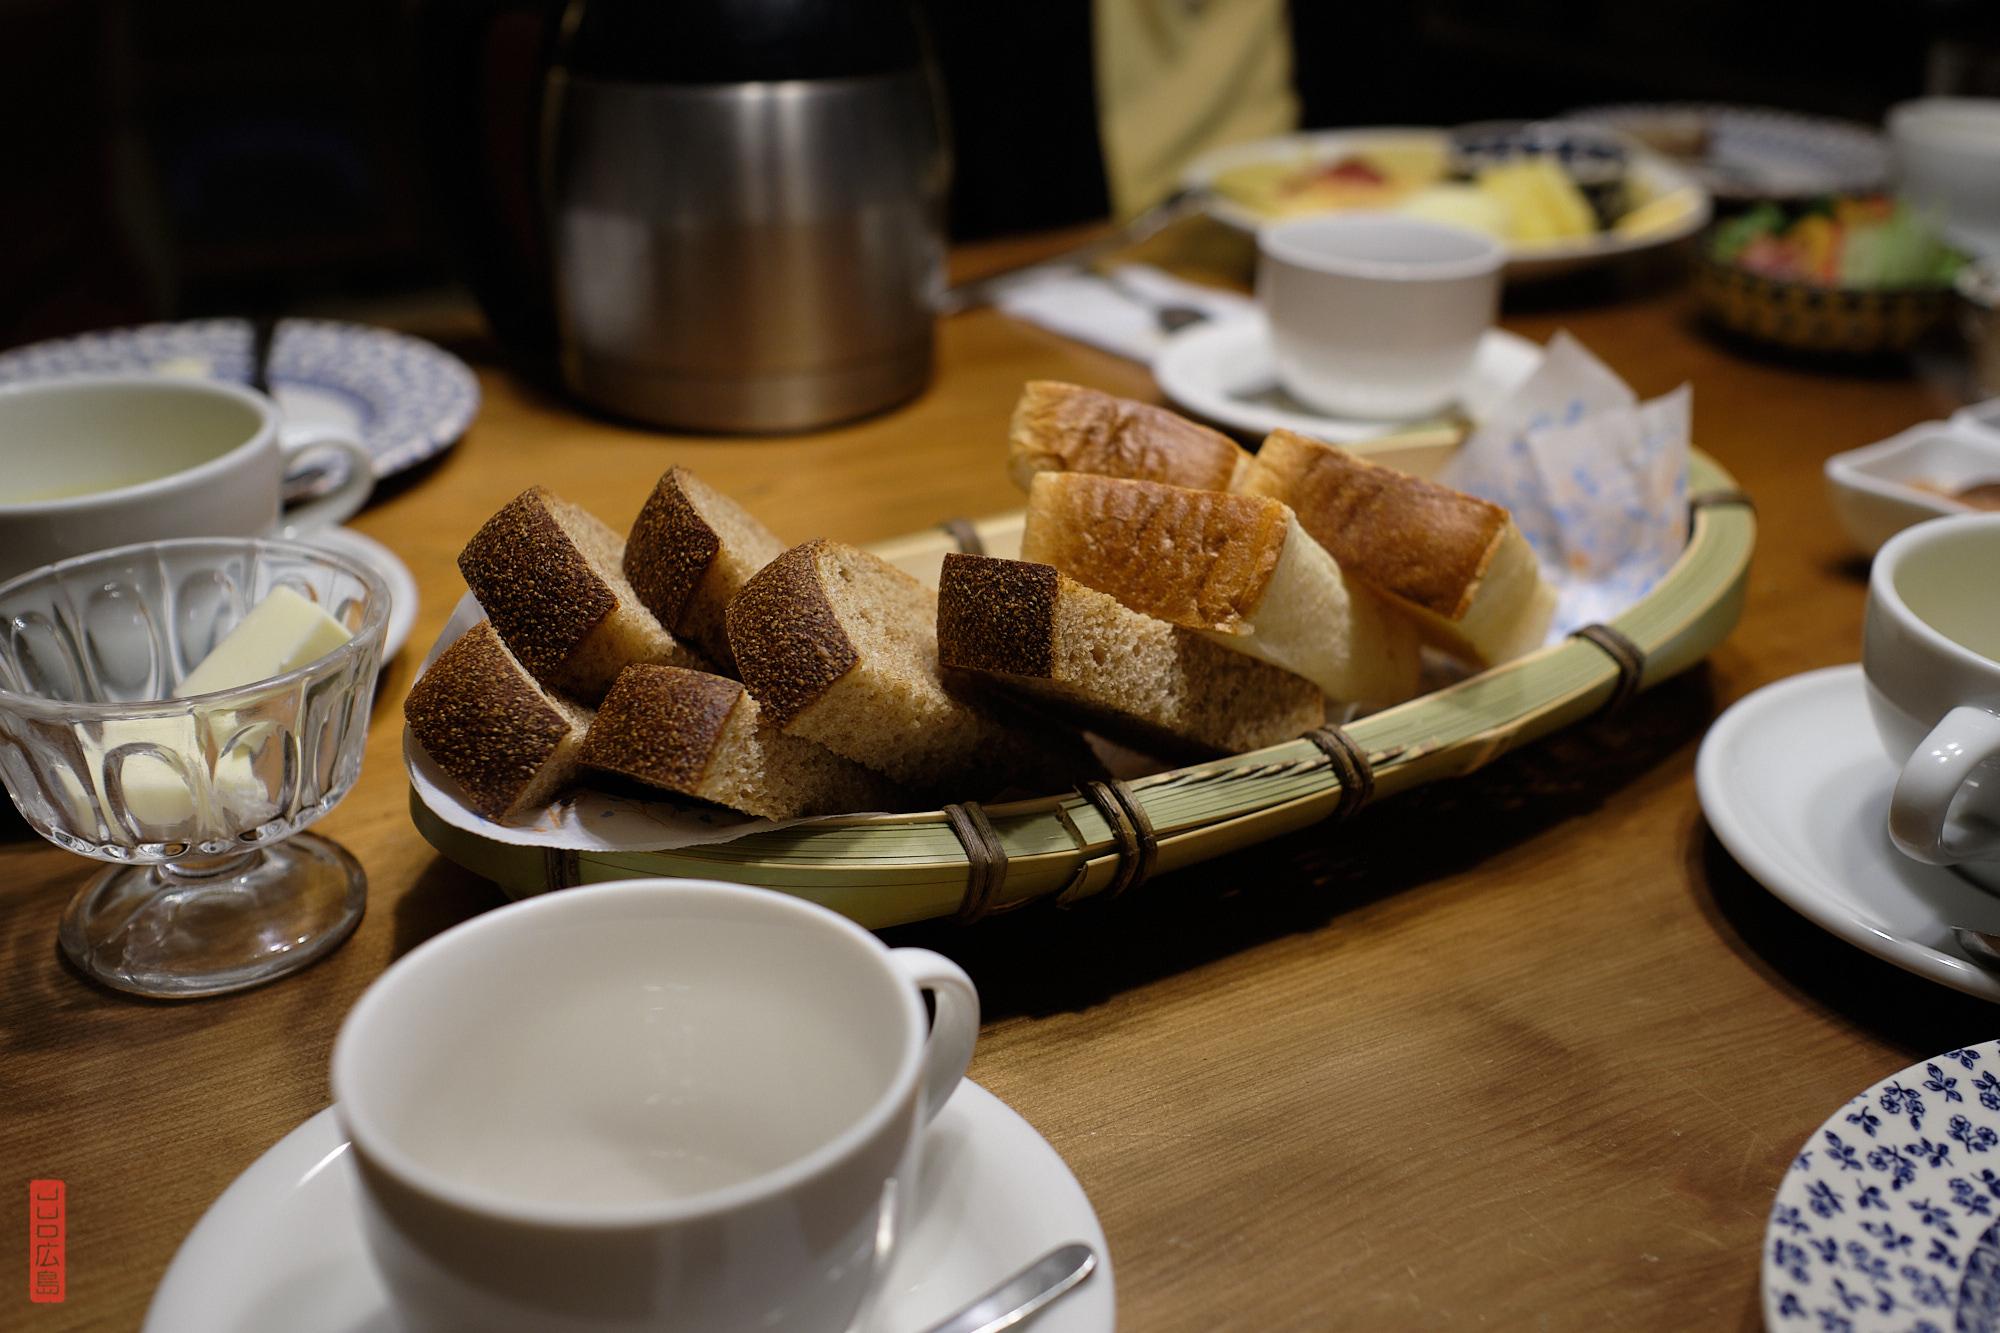 Les petits déjeuners de la pension Dandan, Daisen, Tottori